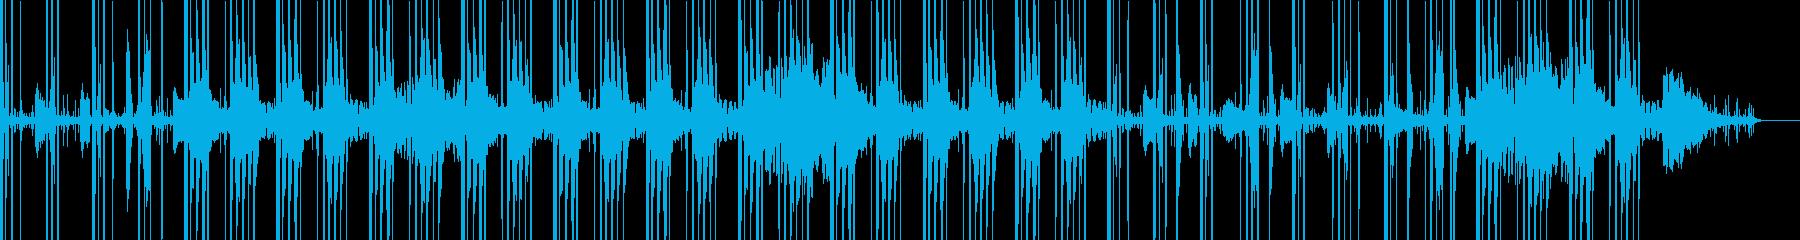 jazzy・チルアウト・ヒップホップの再生済みの波形